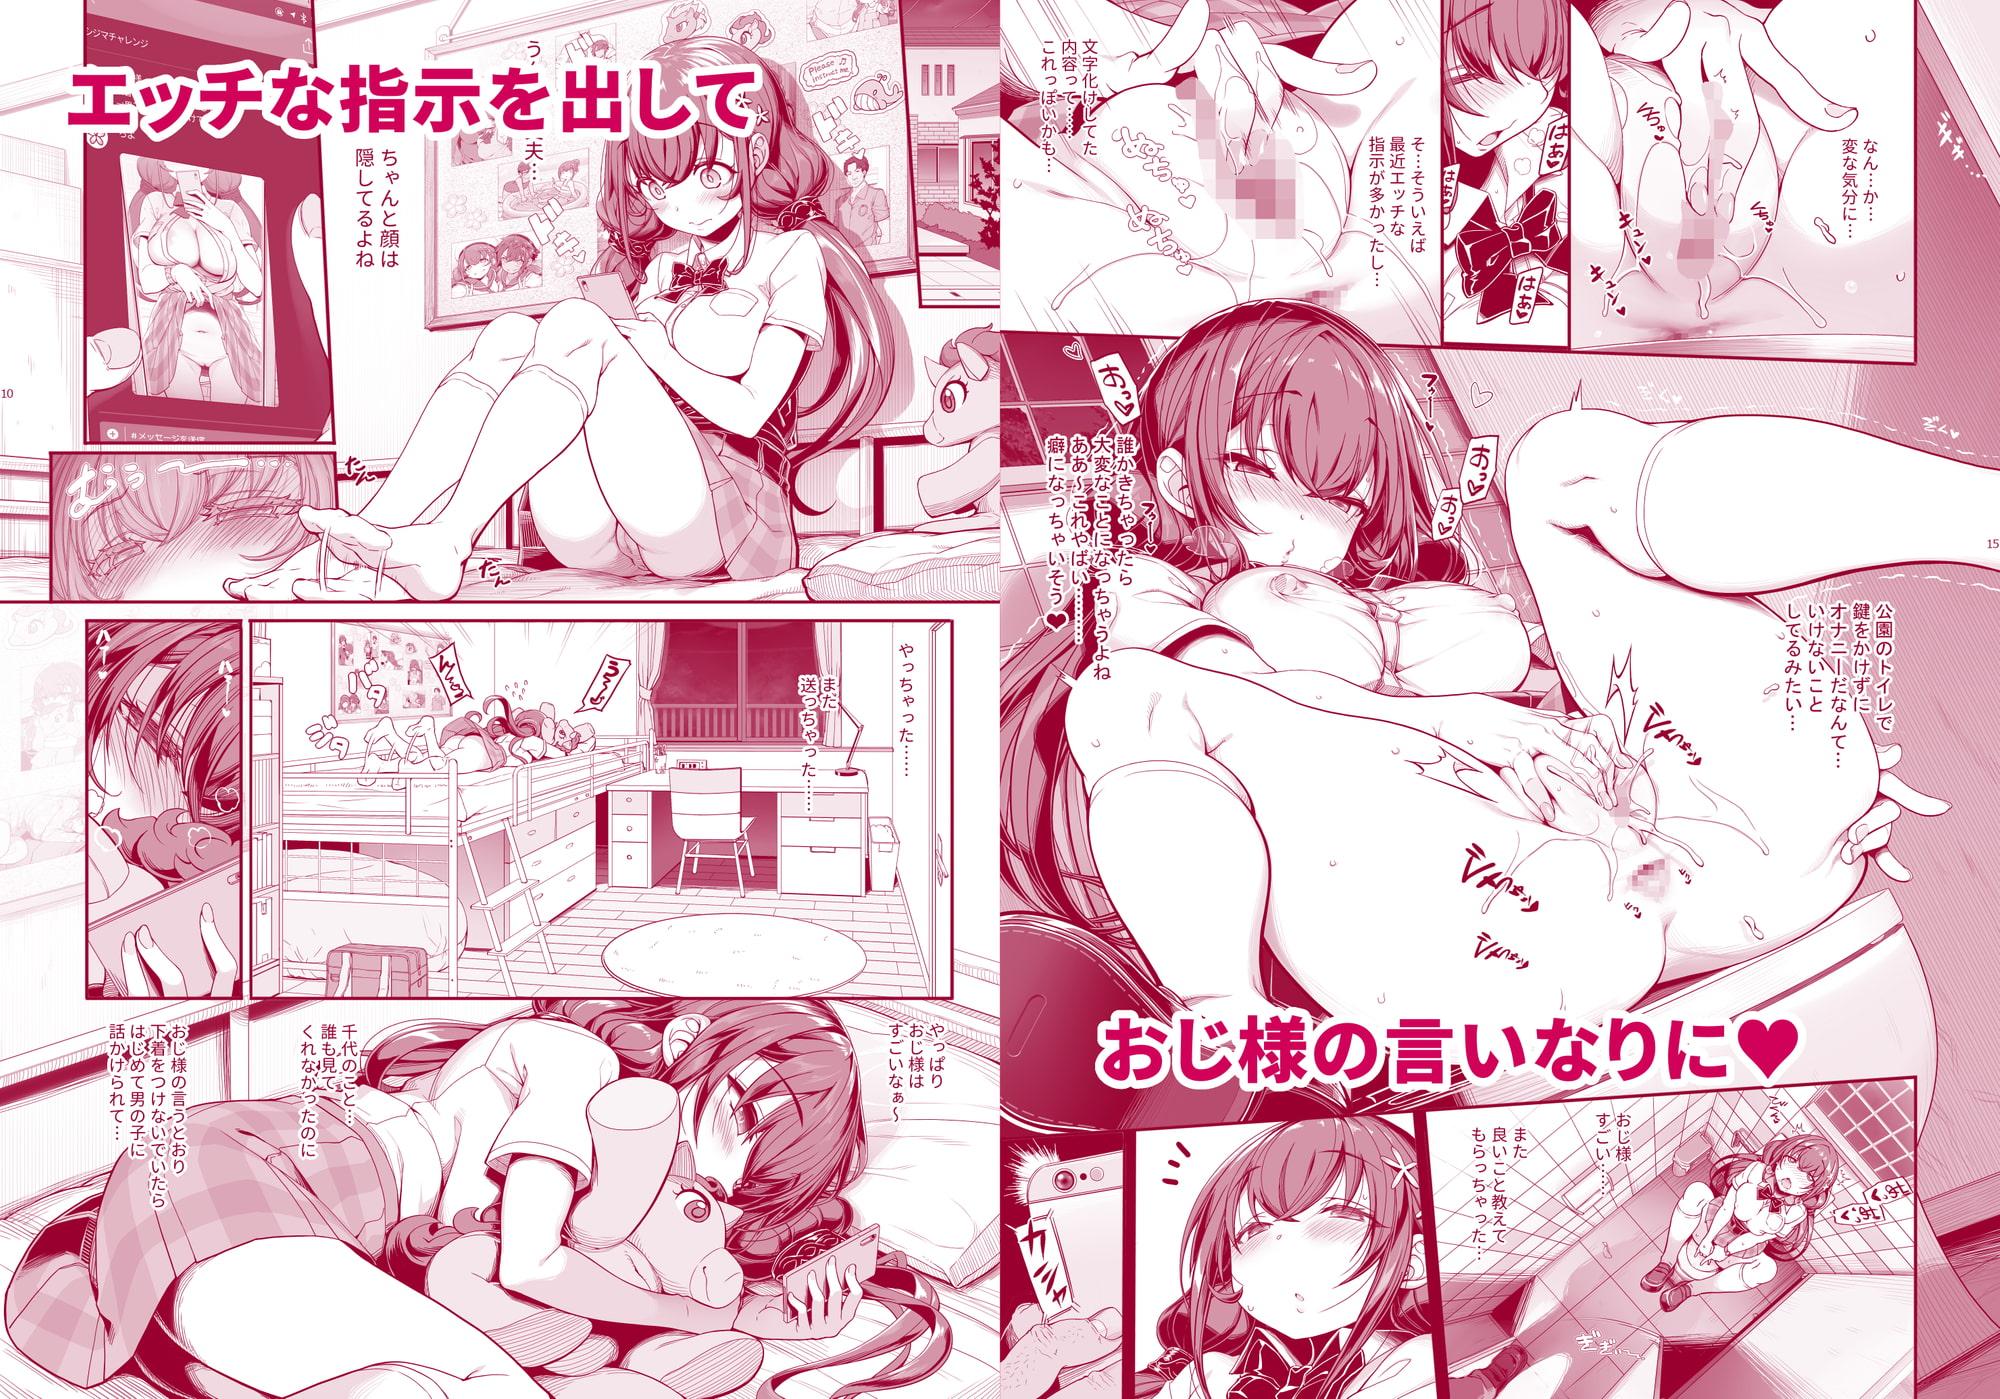 Seeding Man's Schoolgirl Hypno Application